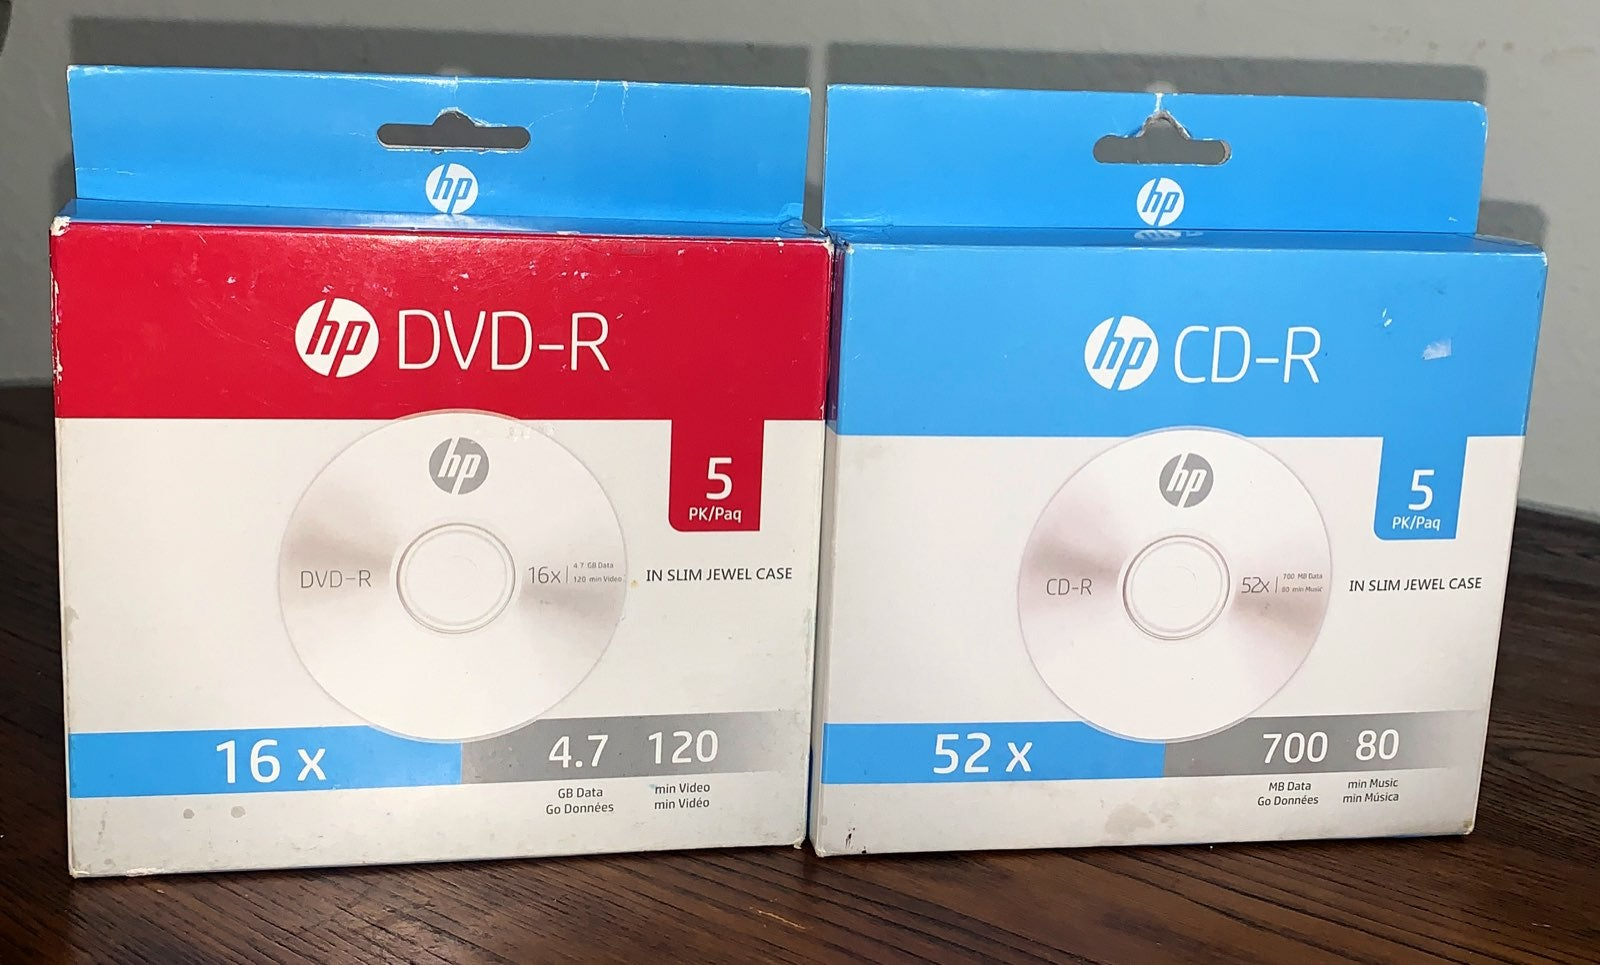 BRAND NEW! (2) pks HP DVD-R & CD-R Bundl